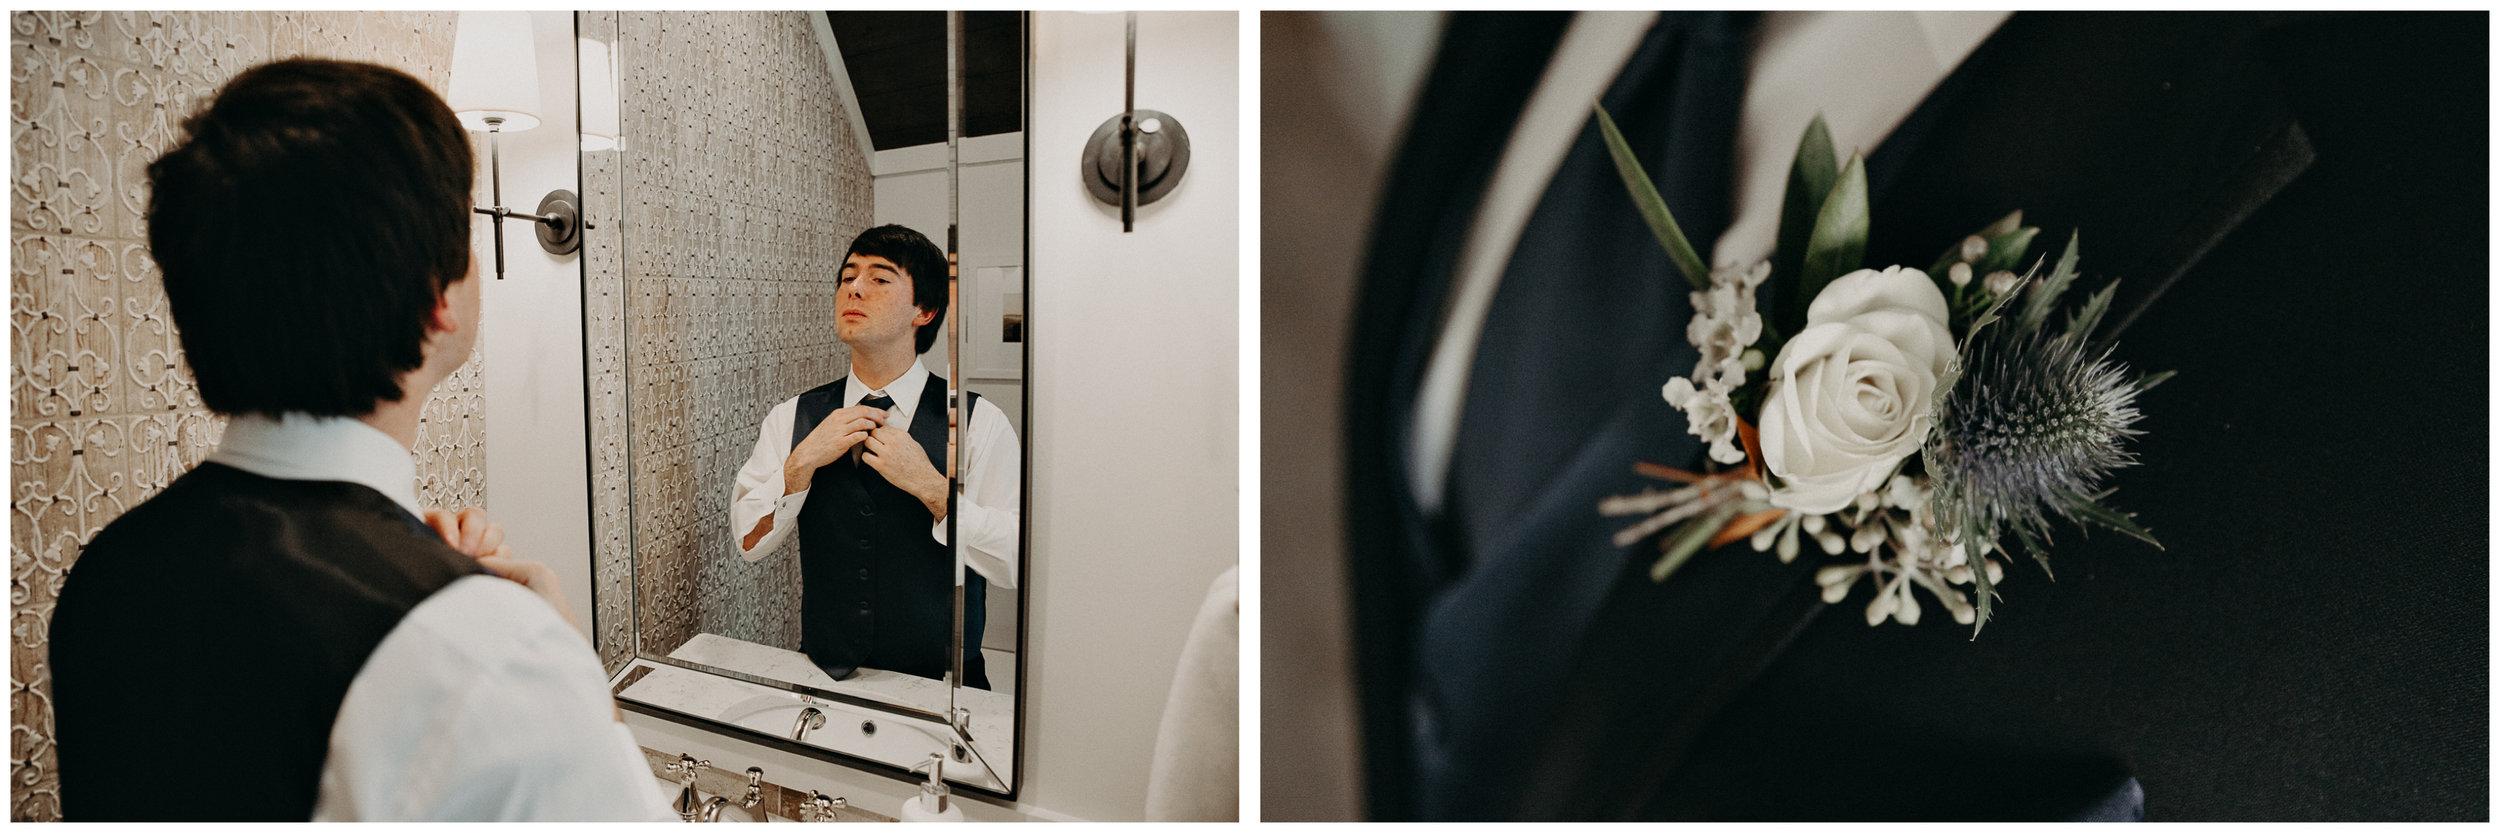 26- Wedding_day_atlanta_georgia_groom_portraits_aline_marin_photography.jpg